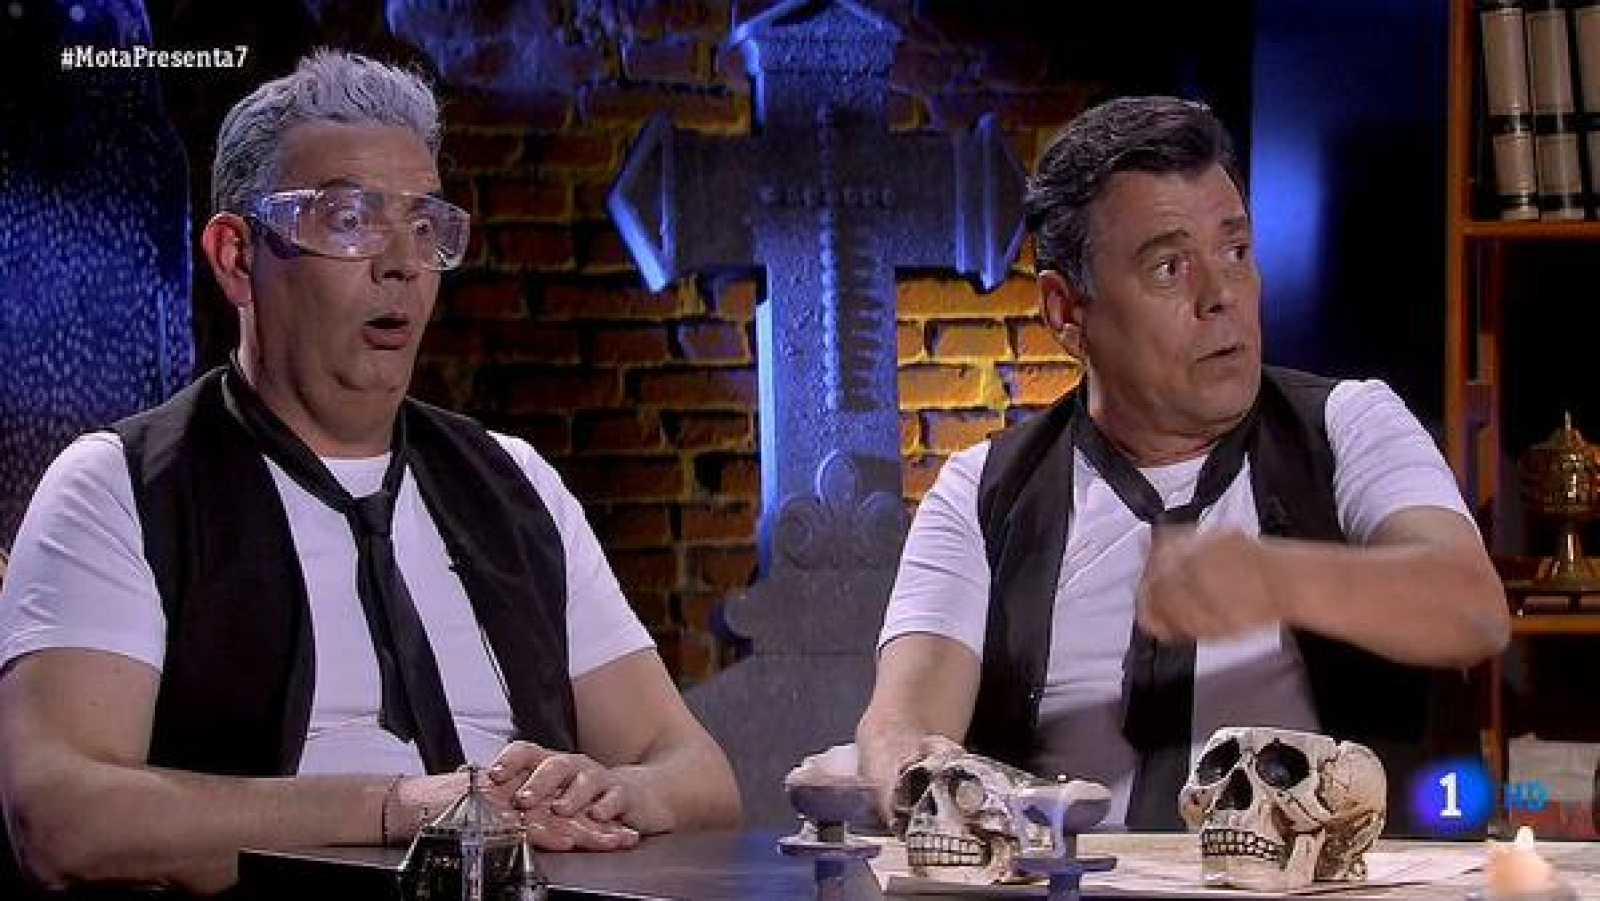 José Mota Presenta... \'Cuarto milenio\' - Chungofonías - RTVE.es